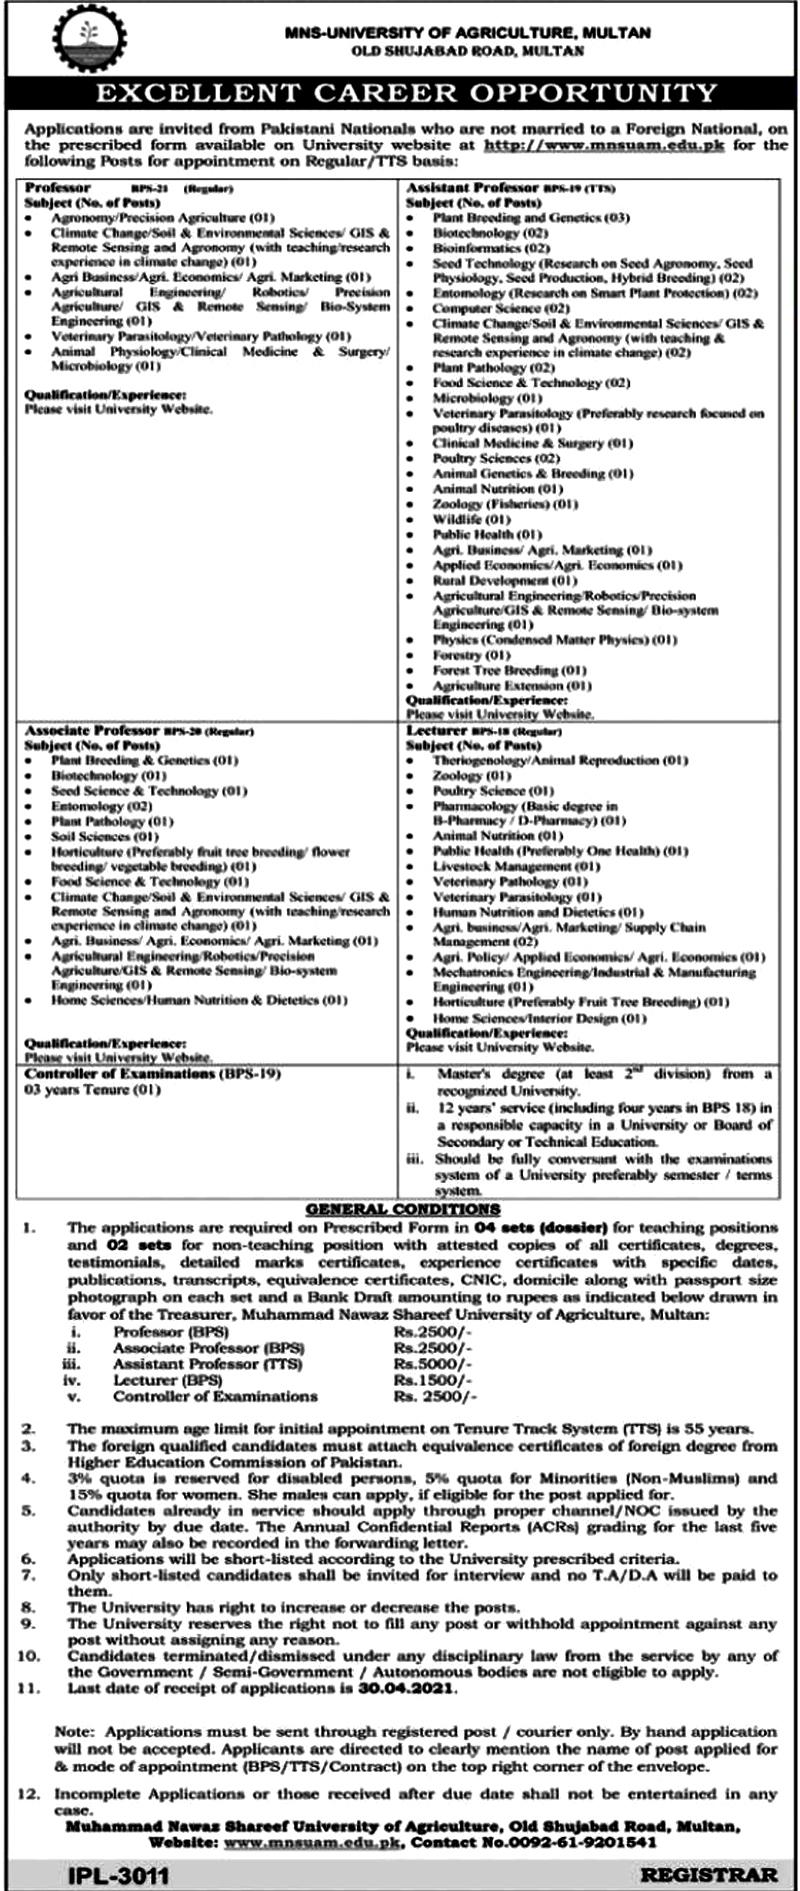 Latest Jobs in Muhammad Nawaz Sharif University of Agriculture MNSUA 2021